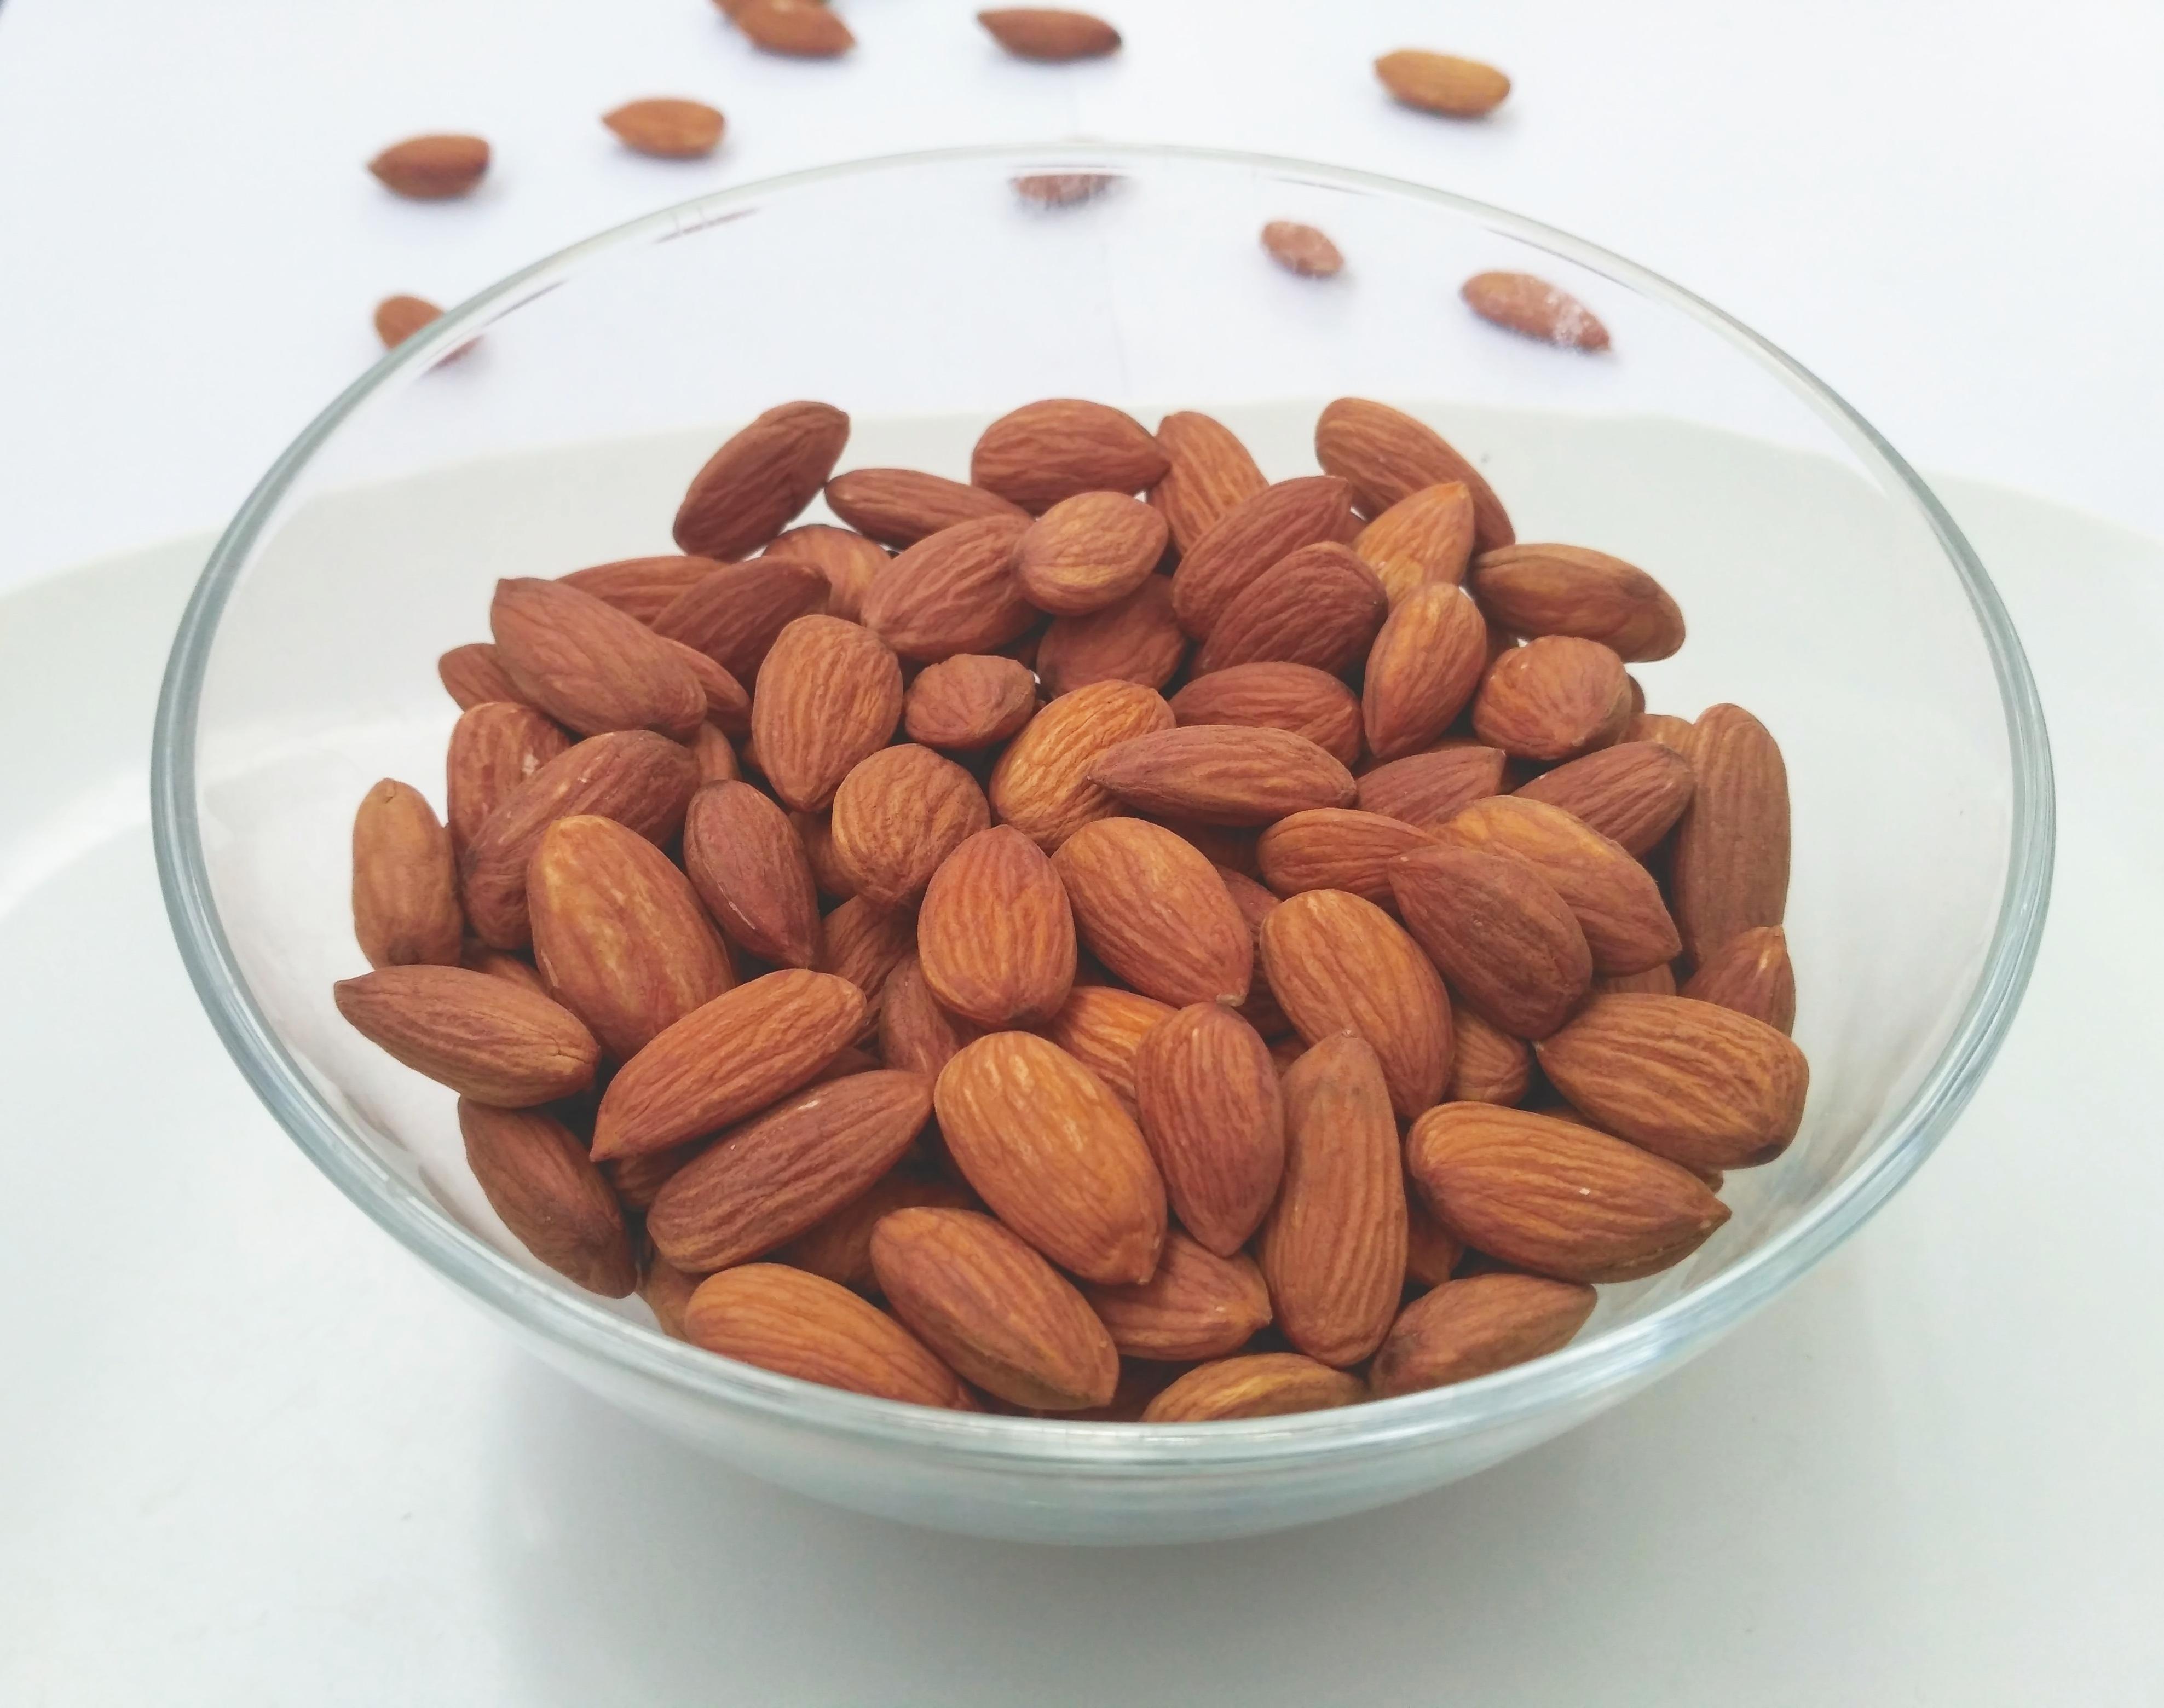 almond oil for skin, hair, nails and health, khadija beauty